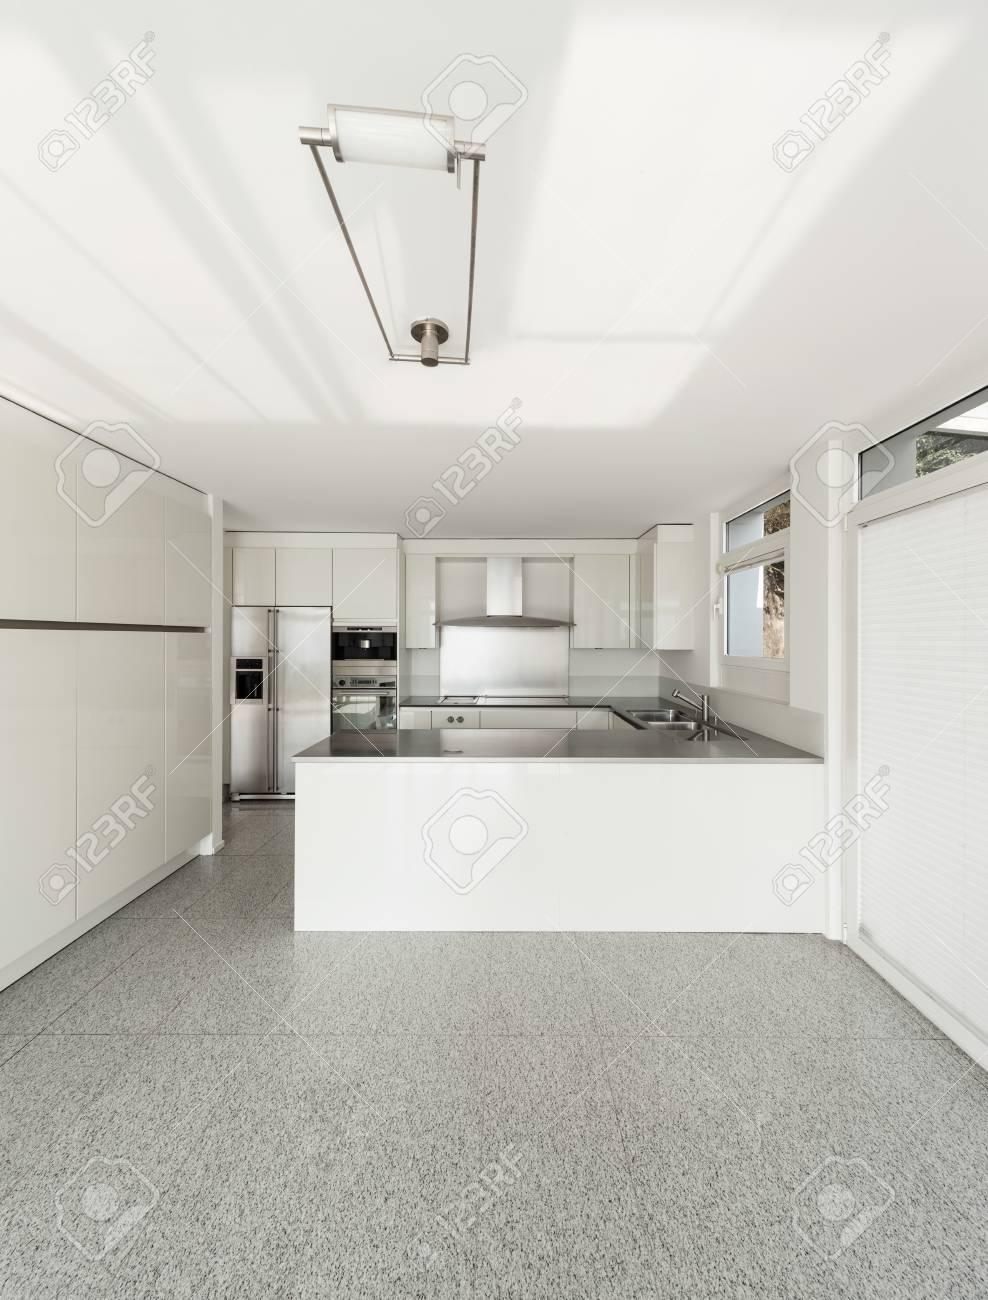 Architecture interior of a modern house white kitchen stock photo 46190515